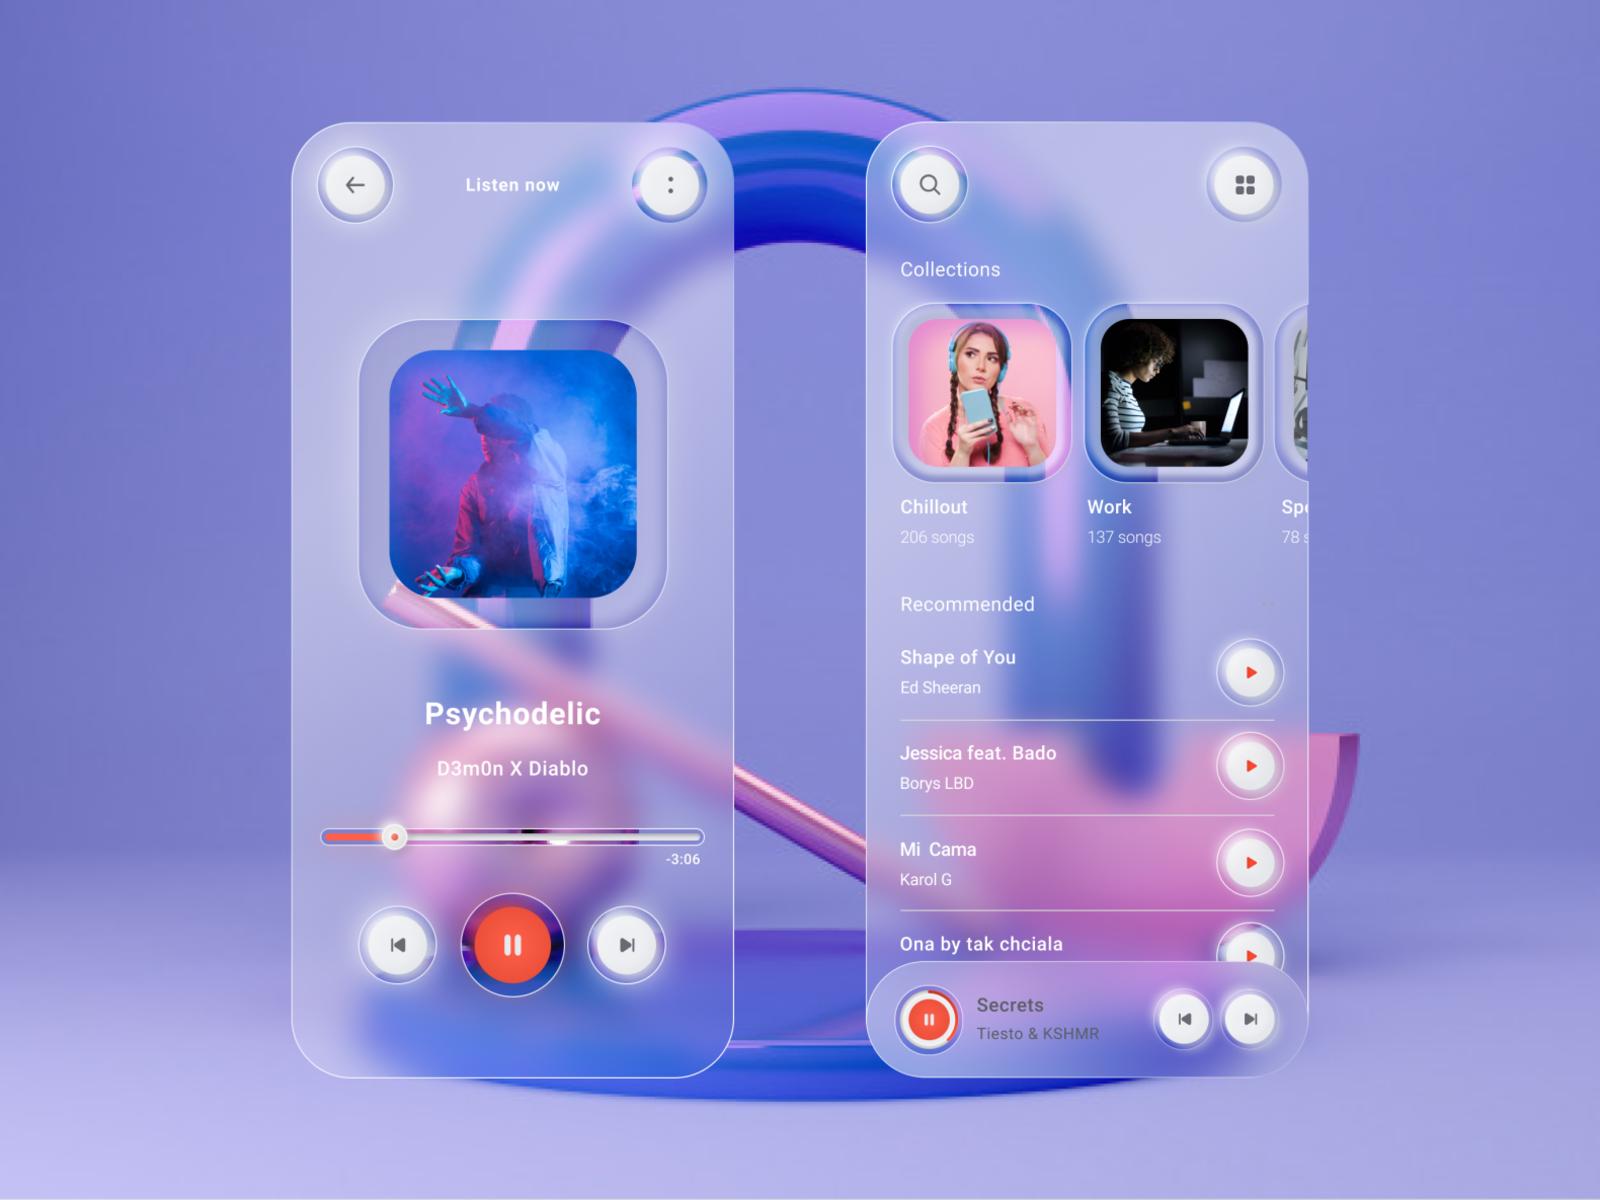 Glassmorphism | Iqonic Design  Mobile UI/UX Design Trends That Will Make Your App Win-The-Trophy!  wTuUXC7 r NppQ6KIctBHMhgdtqBZupMaLvxAywe 5pJZPBepoz7EilB8IMnV4g6r59g204opMp0Y Ghg0btq7z TDDlQsTrpj mYOMXSDcvRTGaJ086uxOM9Cm1KUCFfV1L6uf